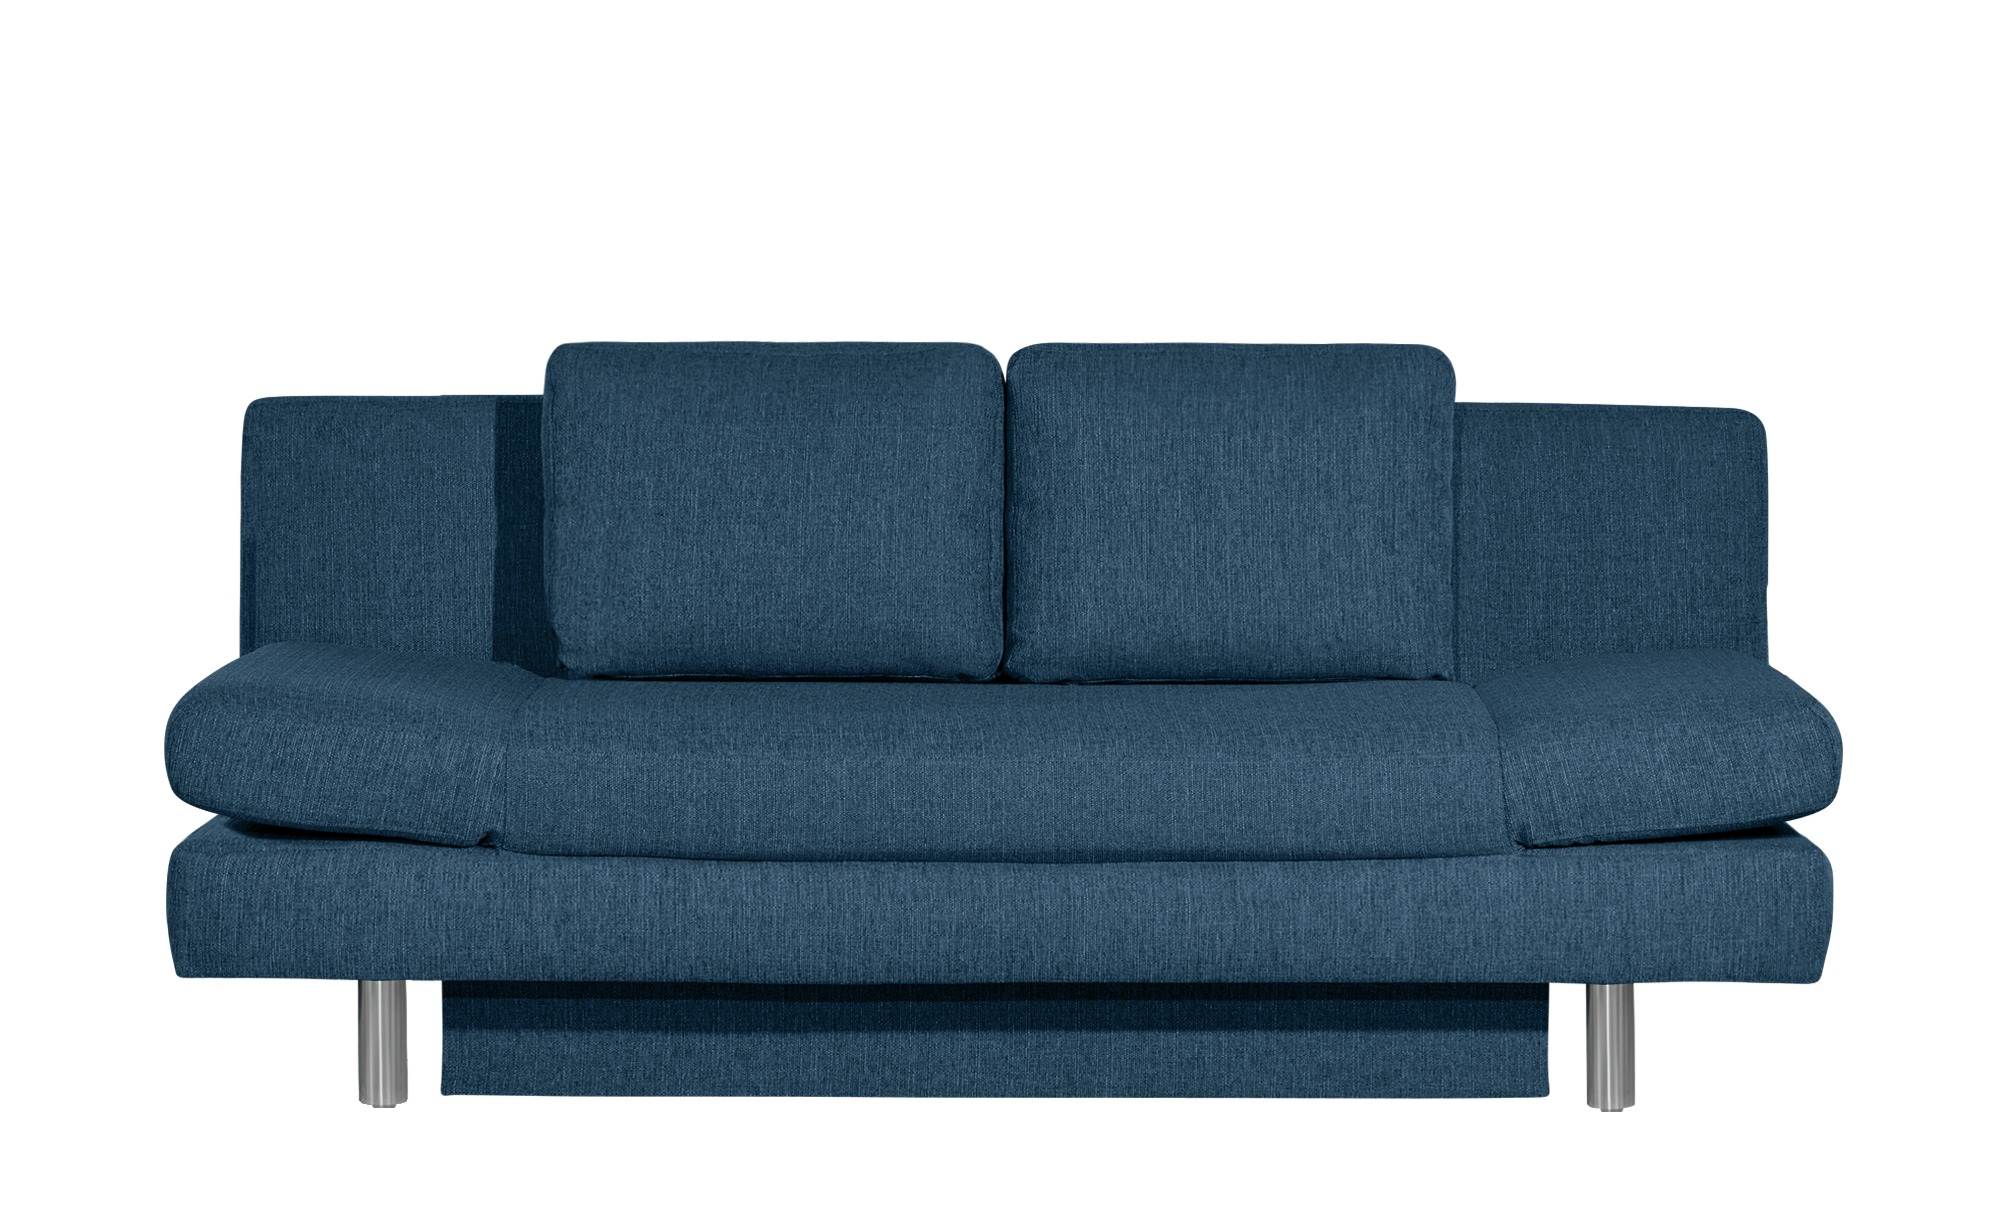 smart Schlafsofa blau - Webstoff Nina ¦ blau ¦ Maße (cm): B: 205 H: 90 T: 95 Polstermöbel > Sofas > 2-Sitzer - Höffner